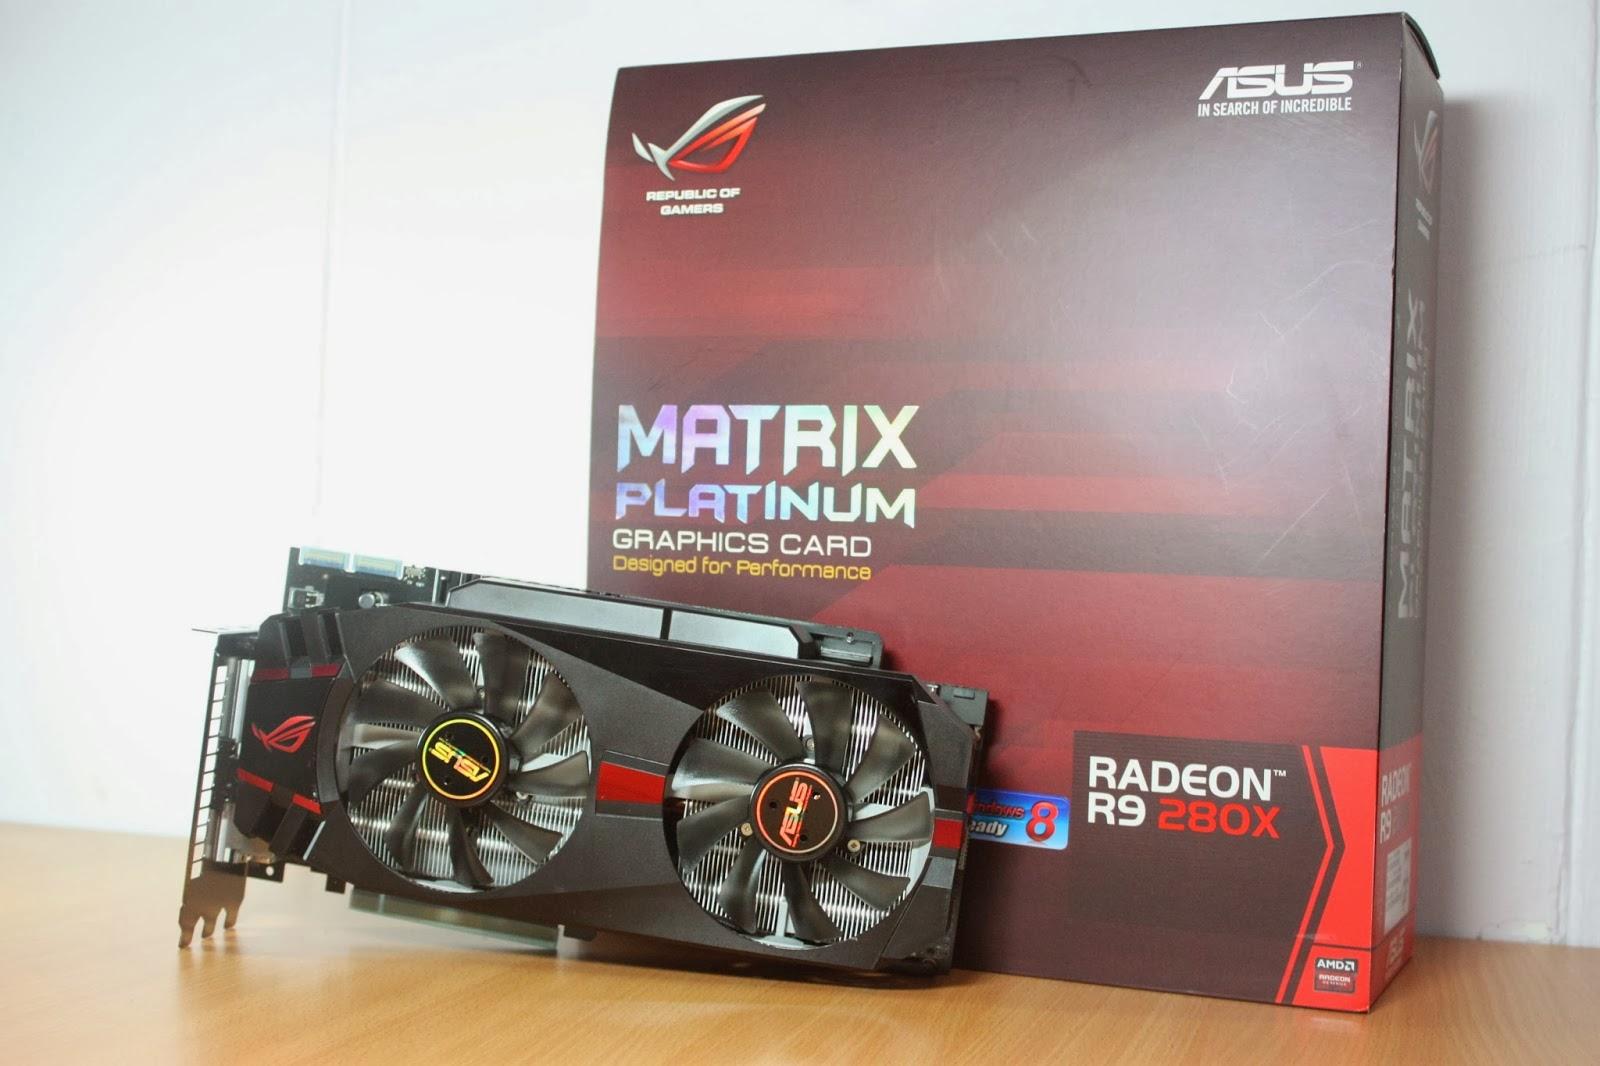 ASUS Radeon R9 280X Matrix Platinum Performance and Overclocking